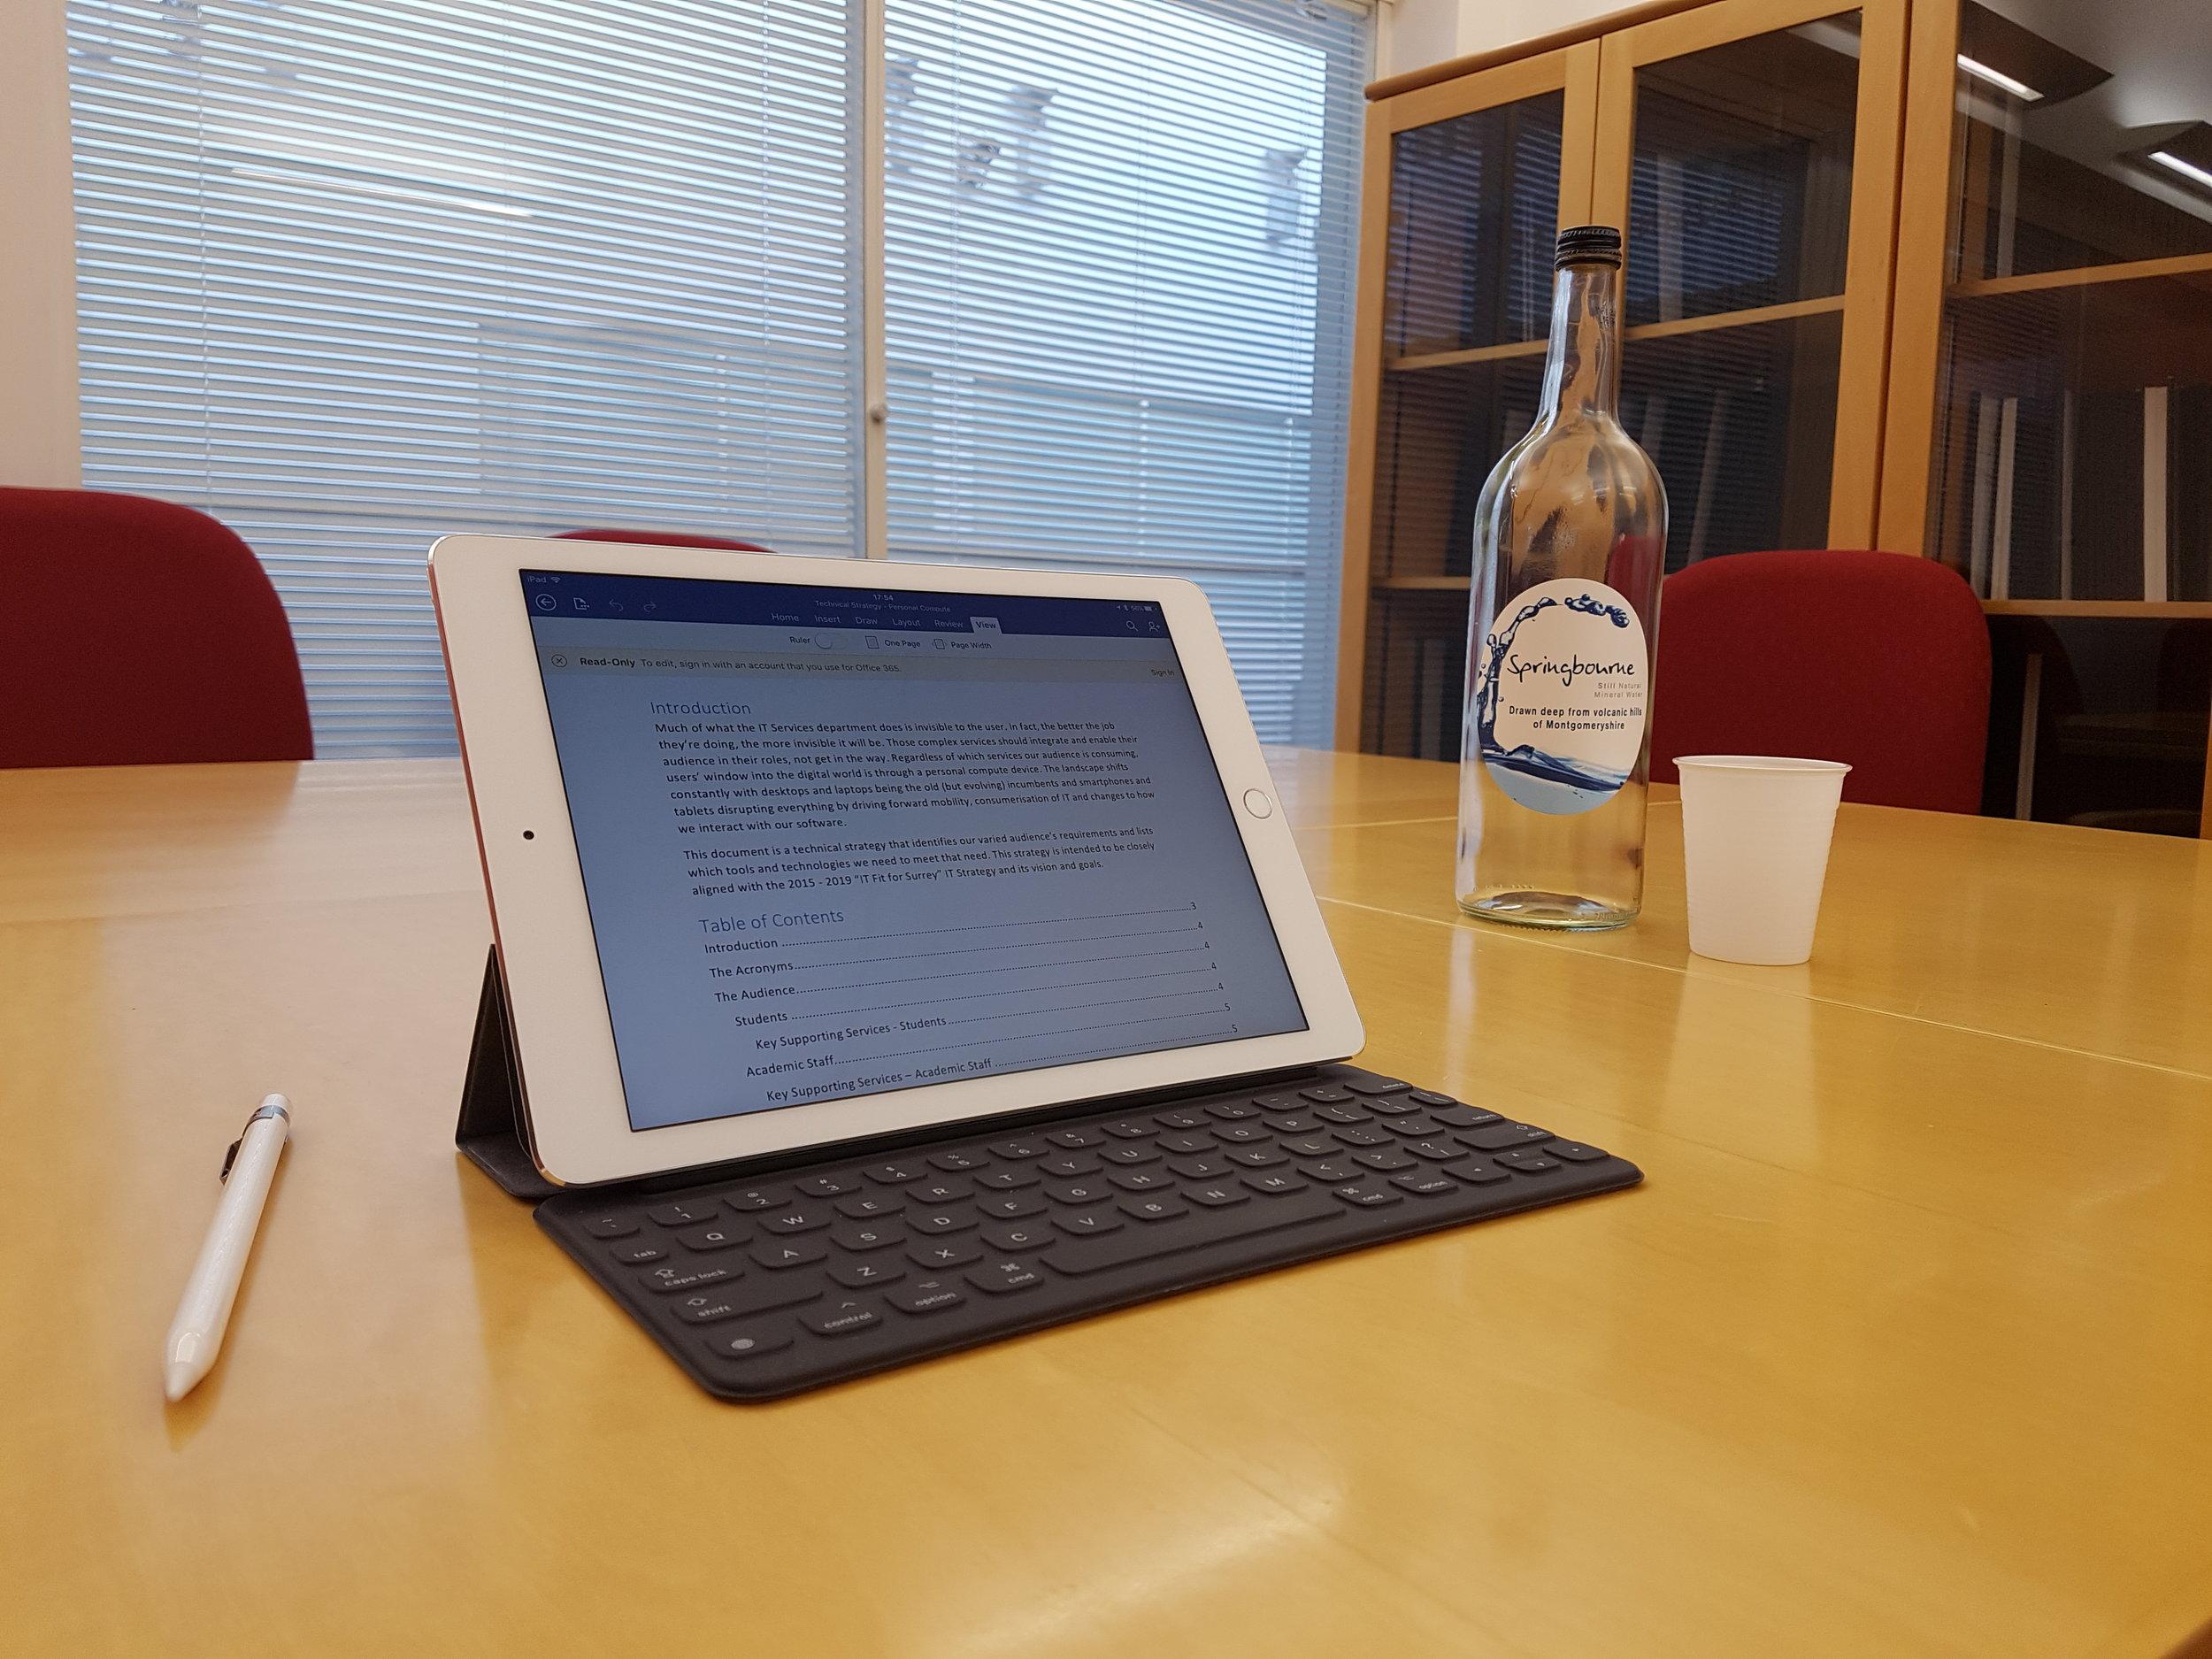 ipad-pro-meeting-room.jpg